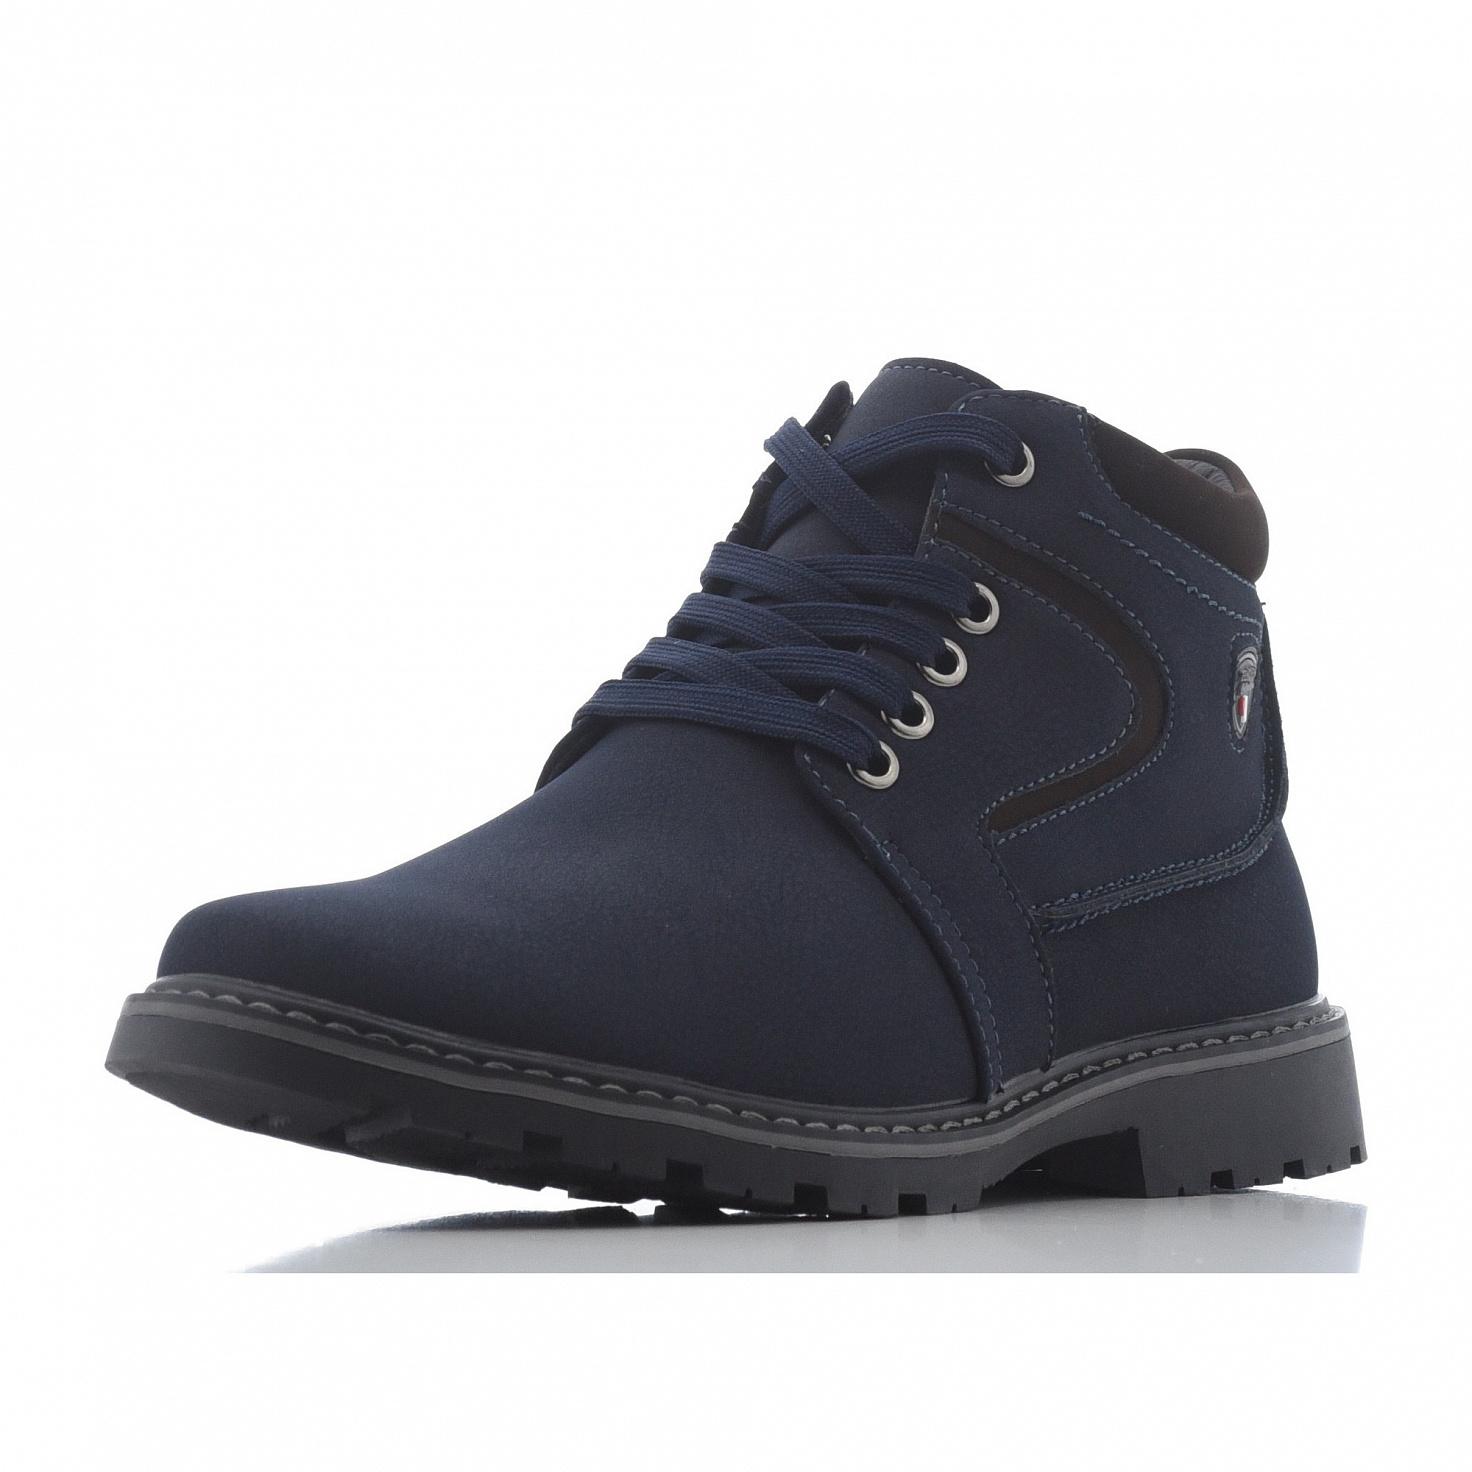 Купить 98-28BL-012SN, Ботинки для мальчиков ZENDEN, цв. синий, р-р 39,